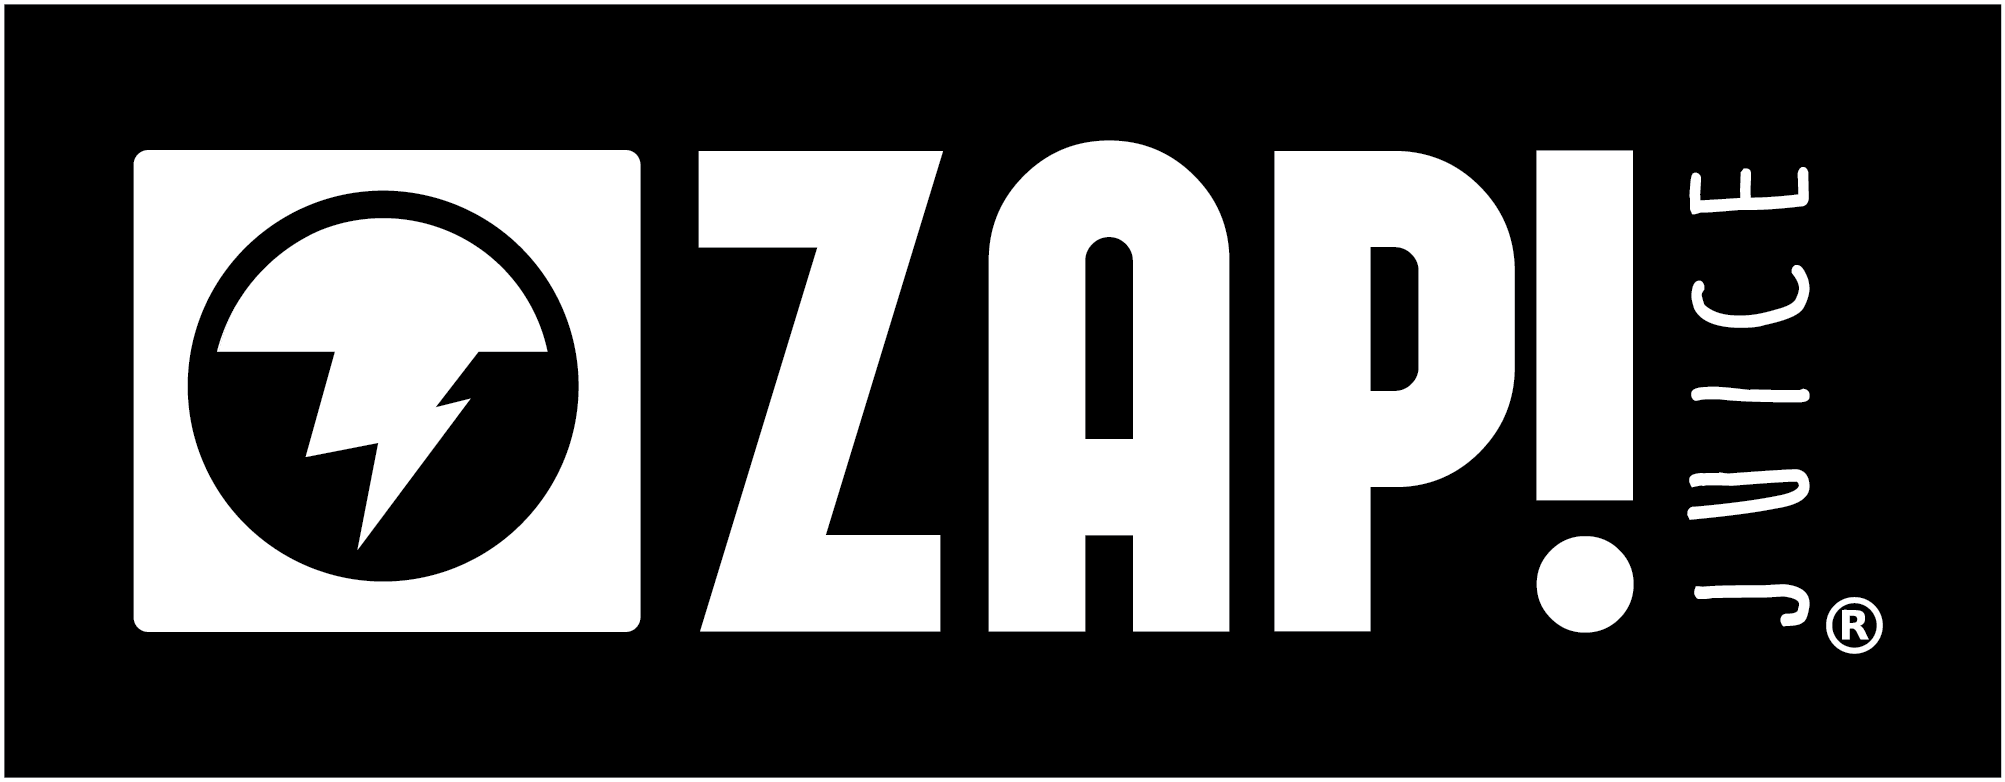 Cigtronica (ZAP)